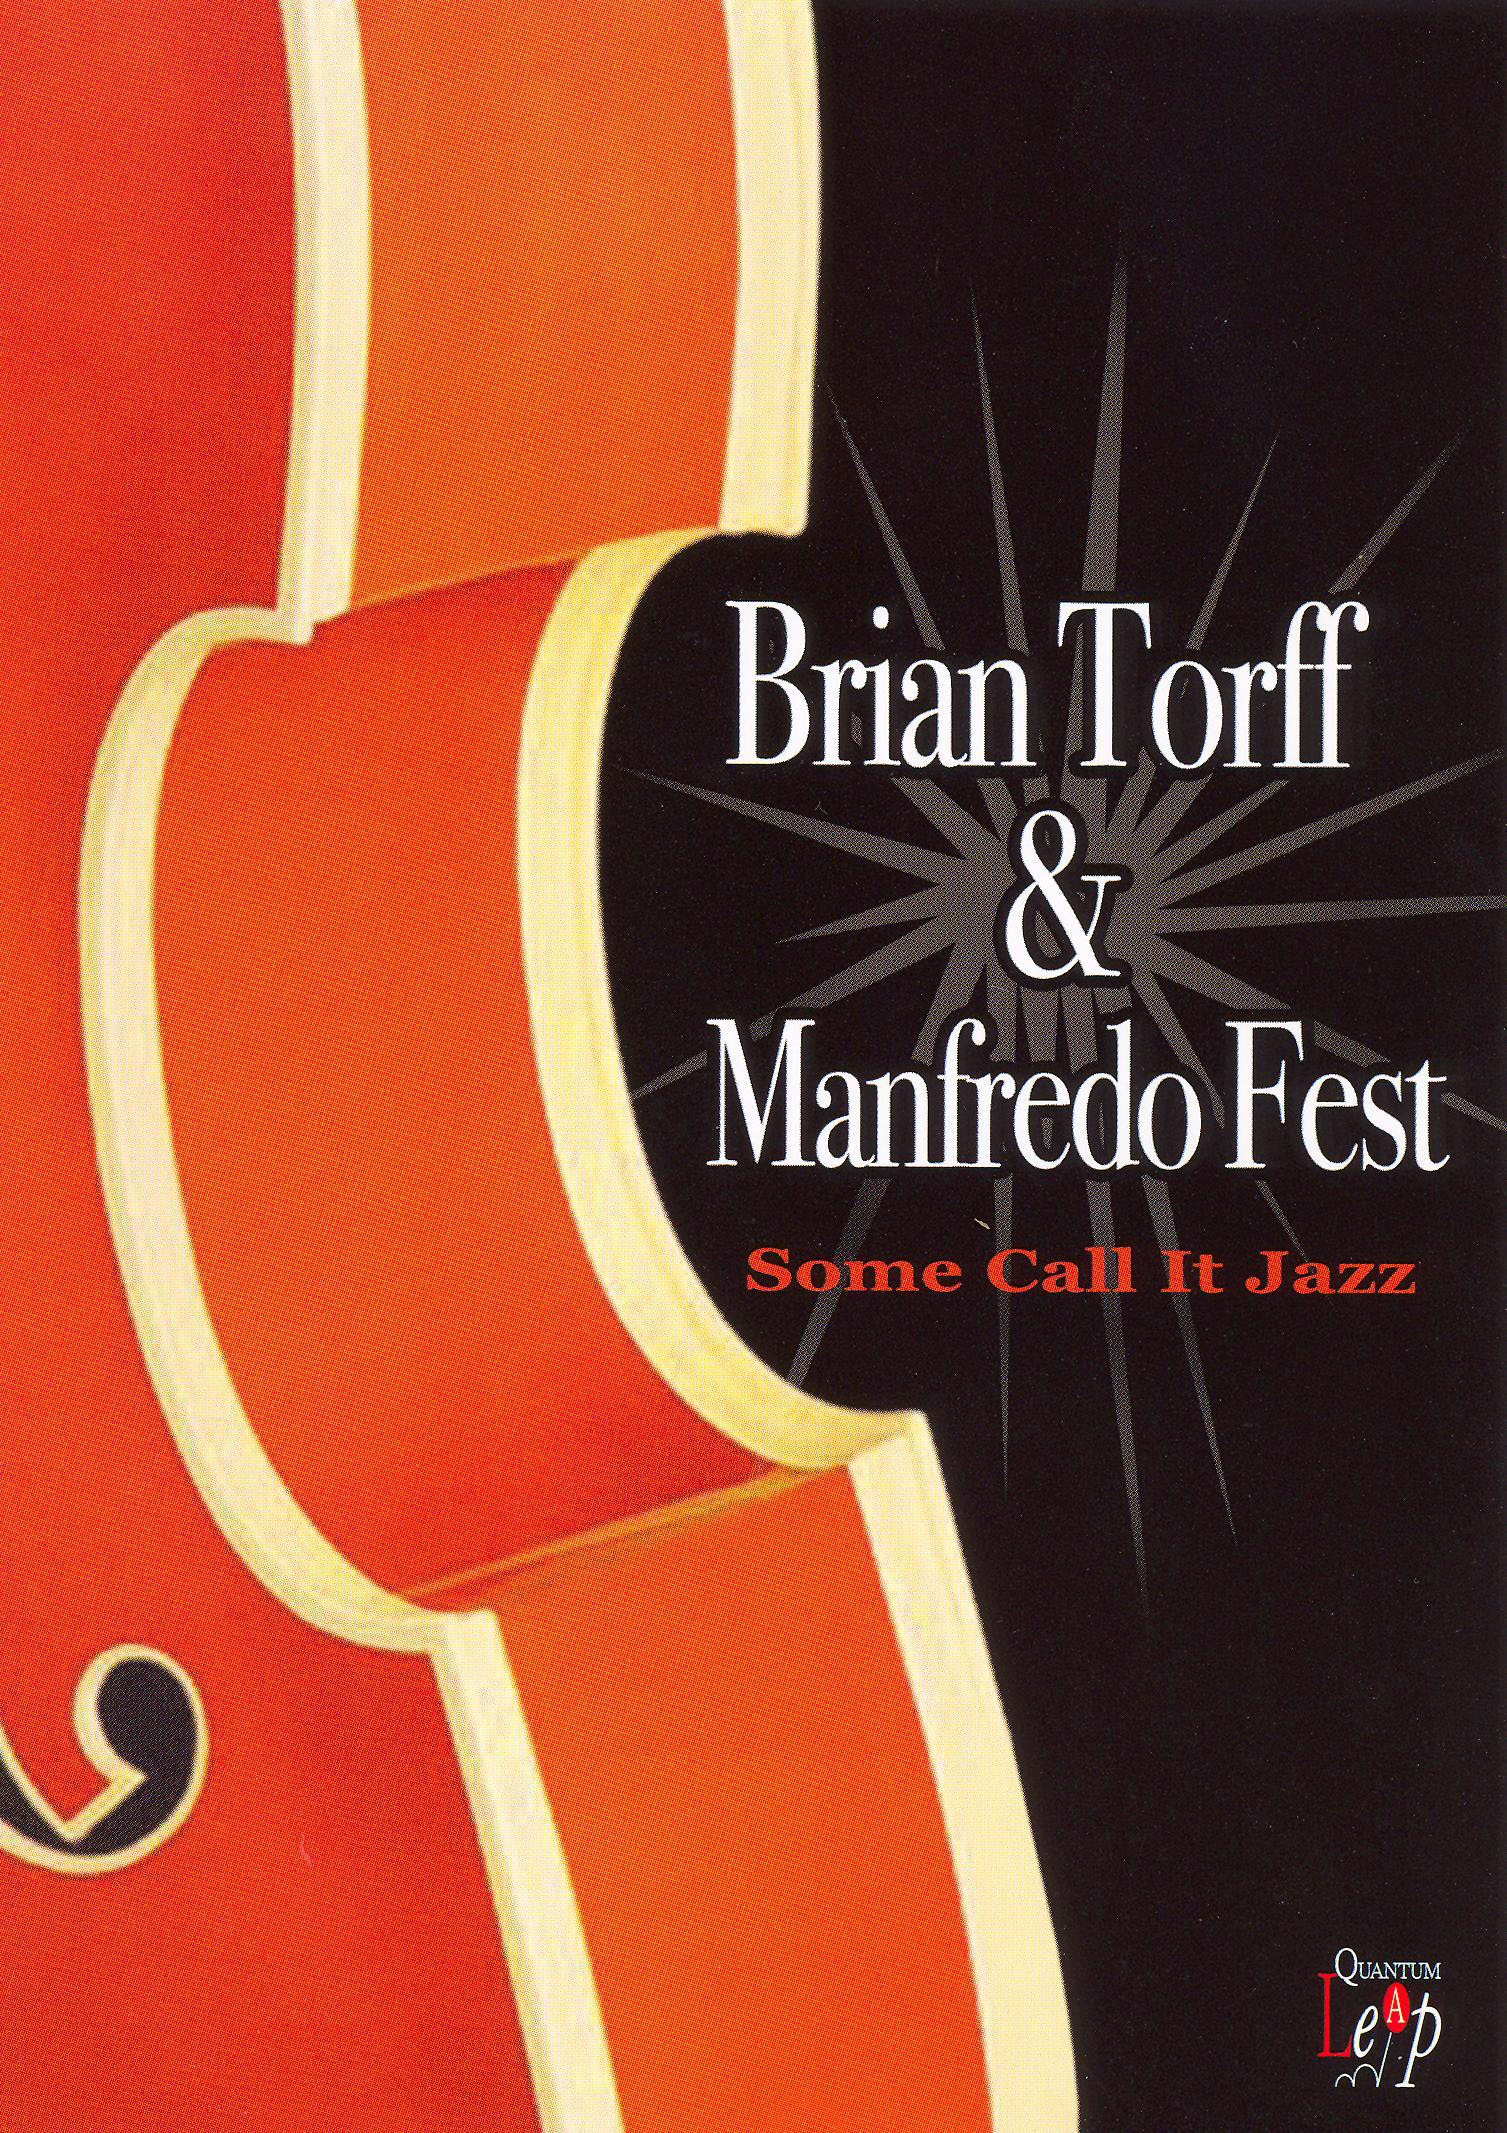 Brian Torff/Manfredo Fest: Live